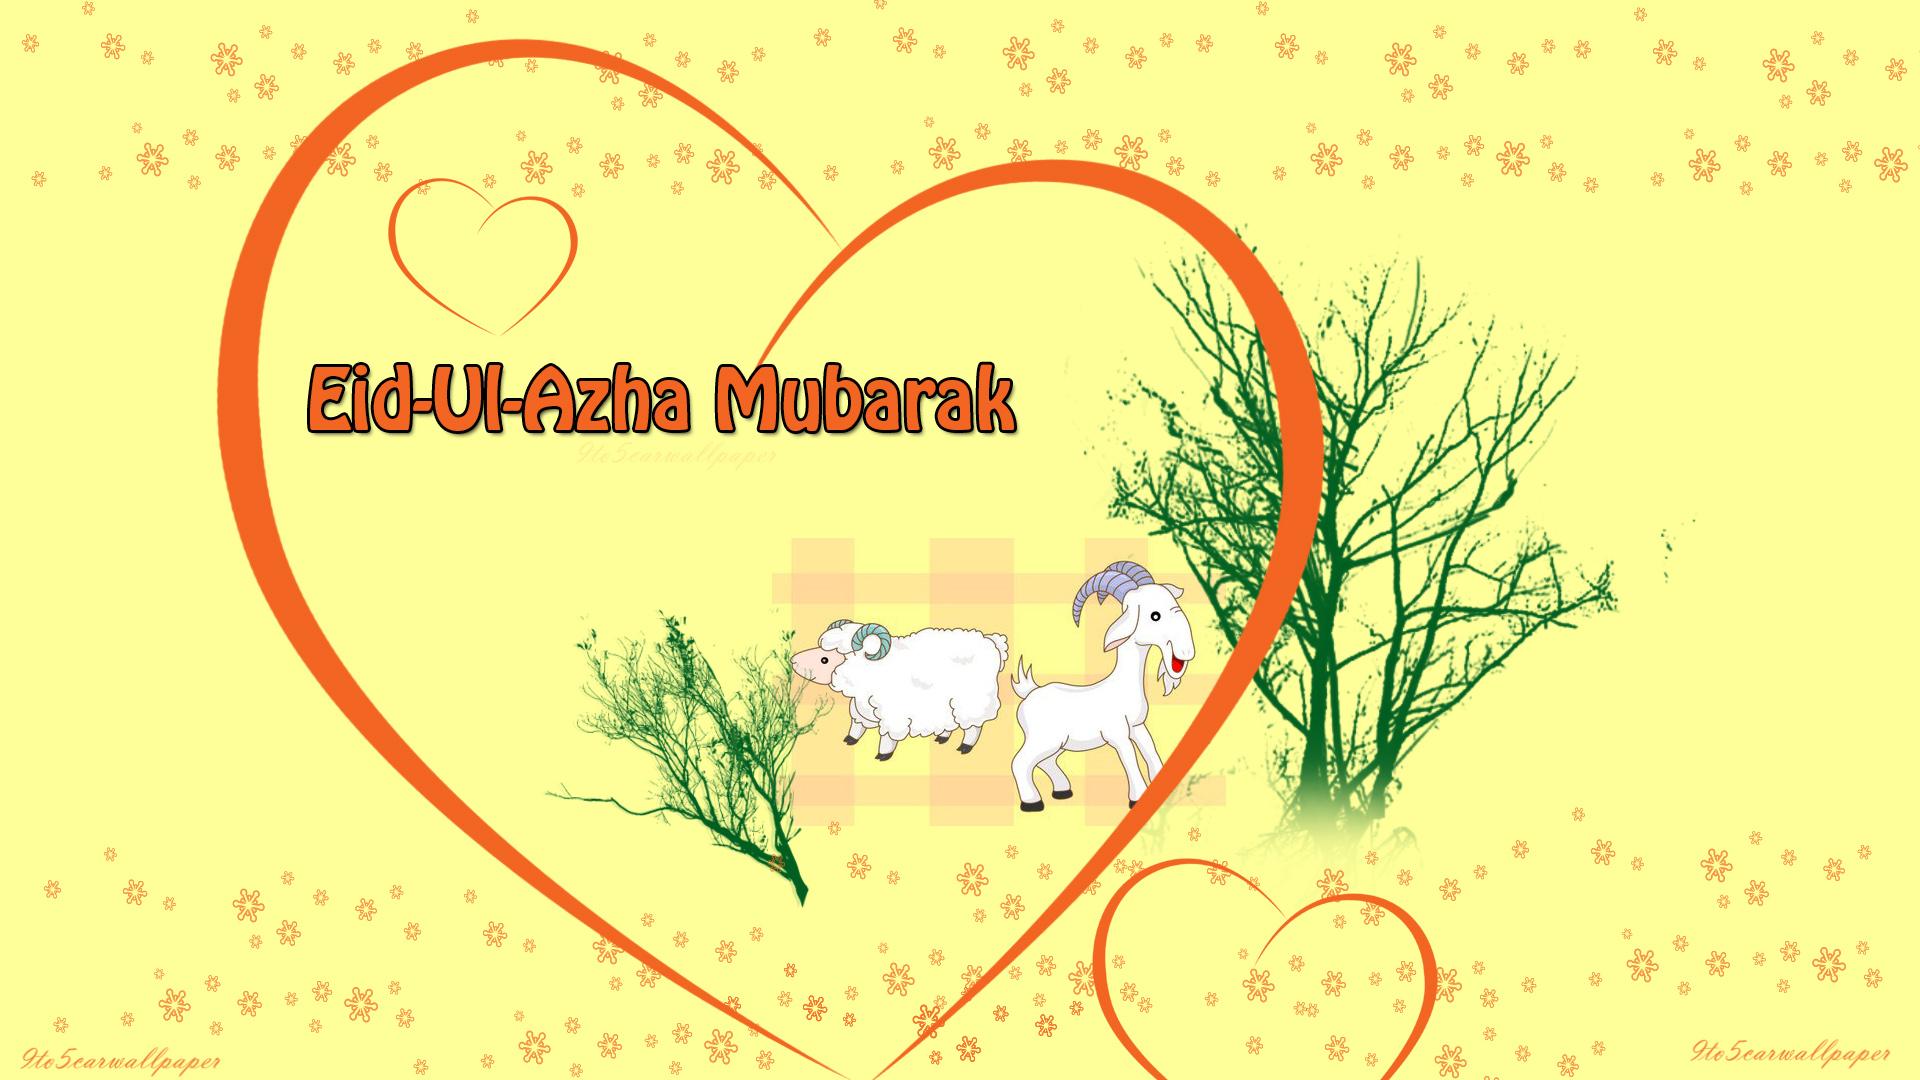 Eid Ul Adha Mubarak Greeting Cards